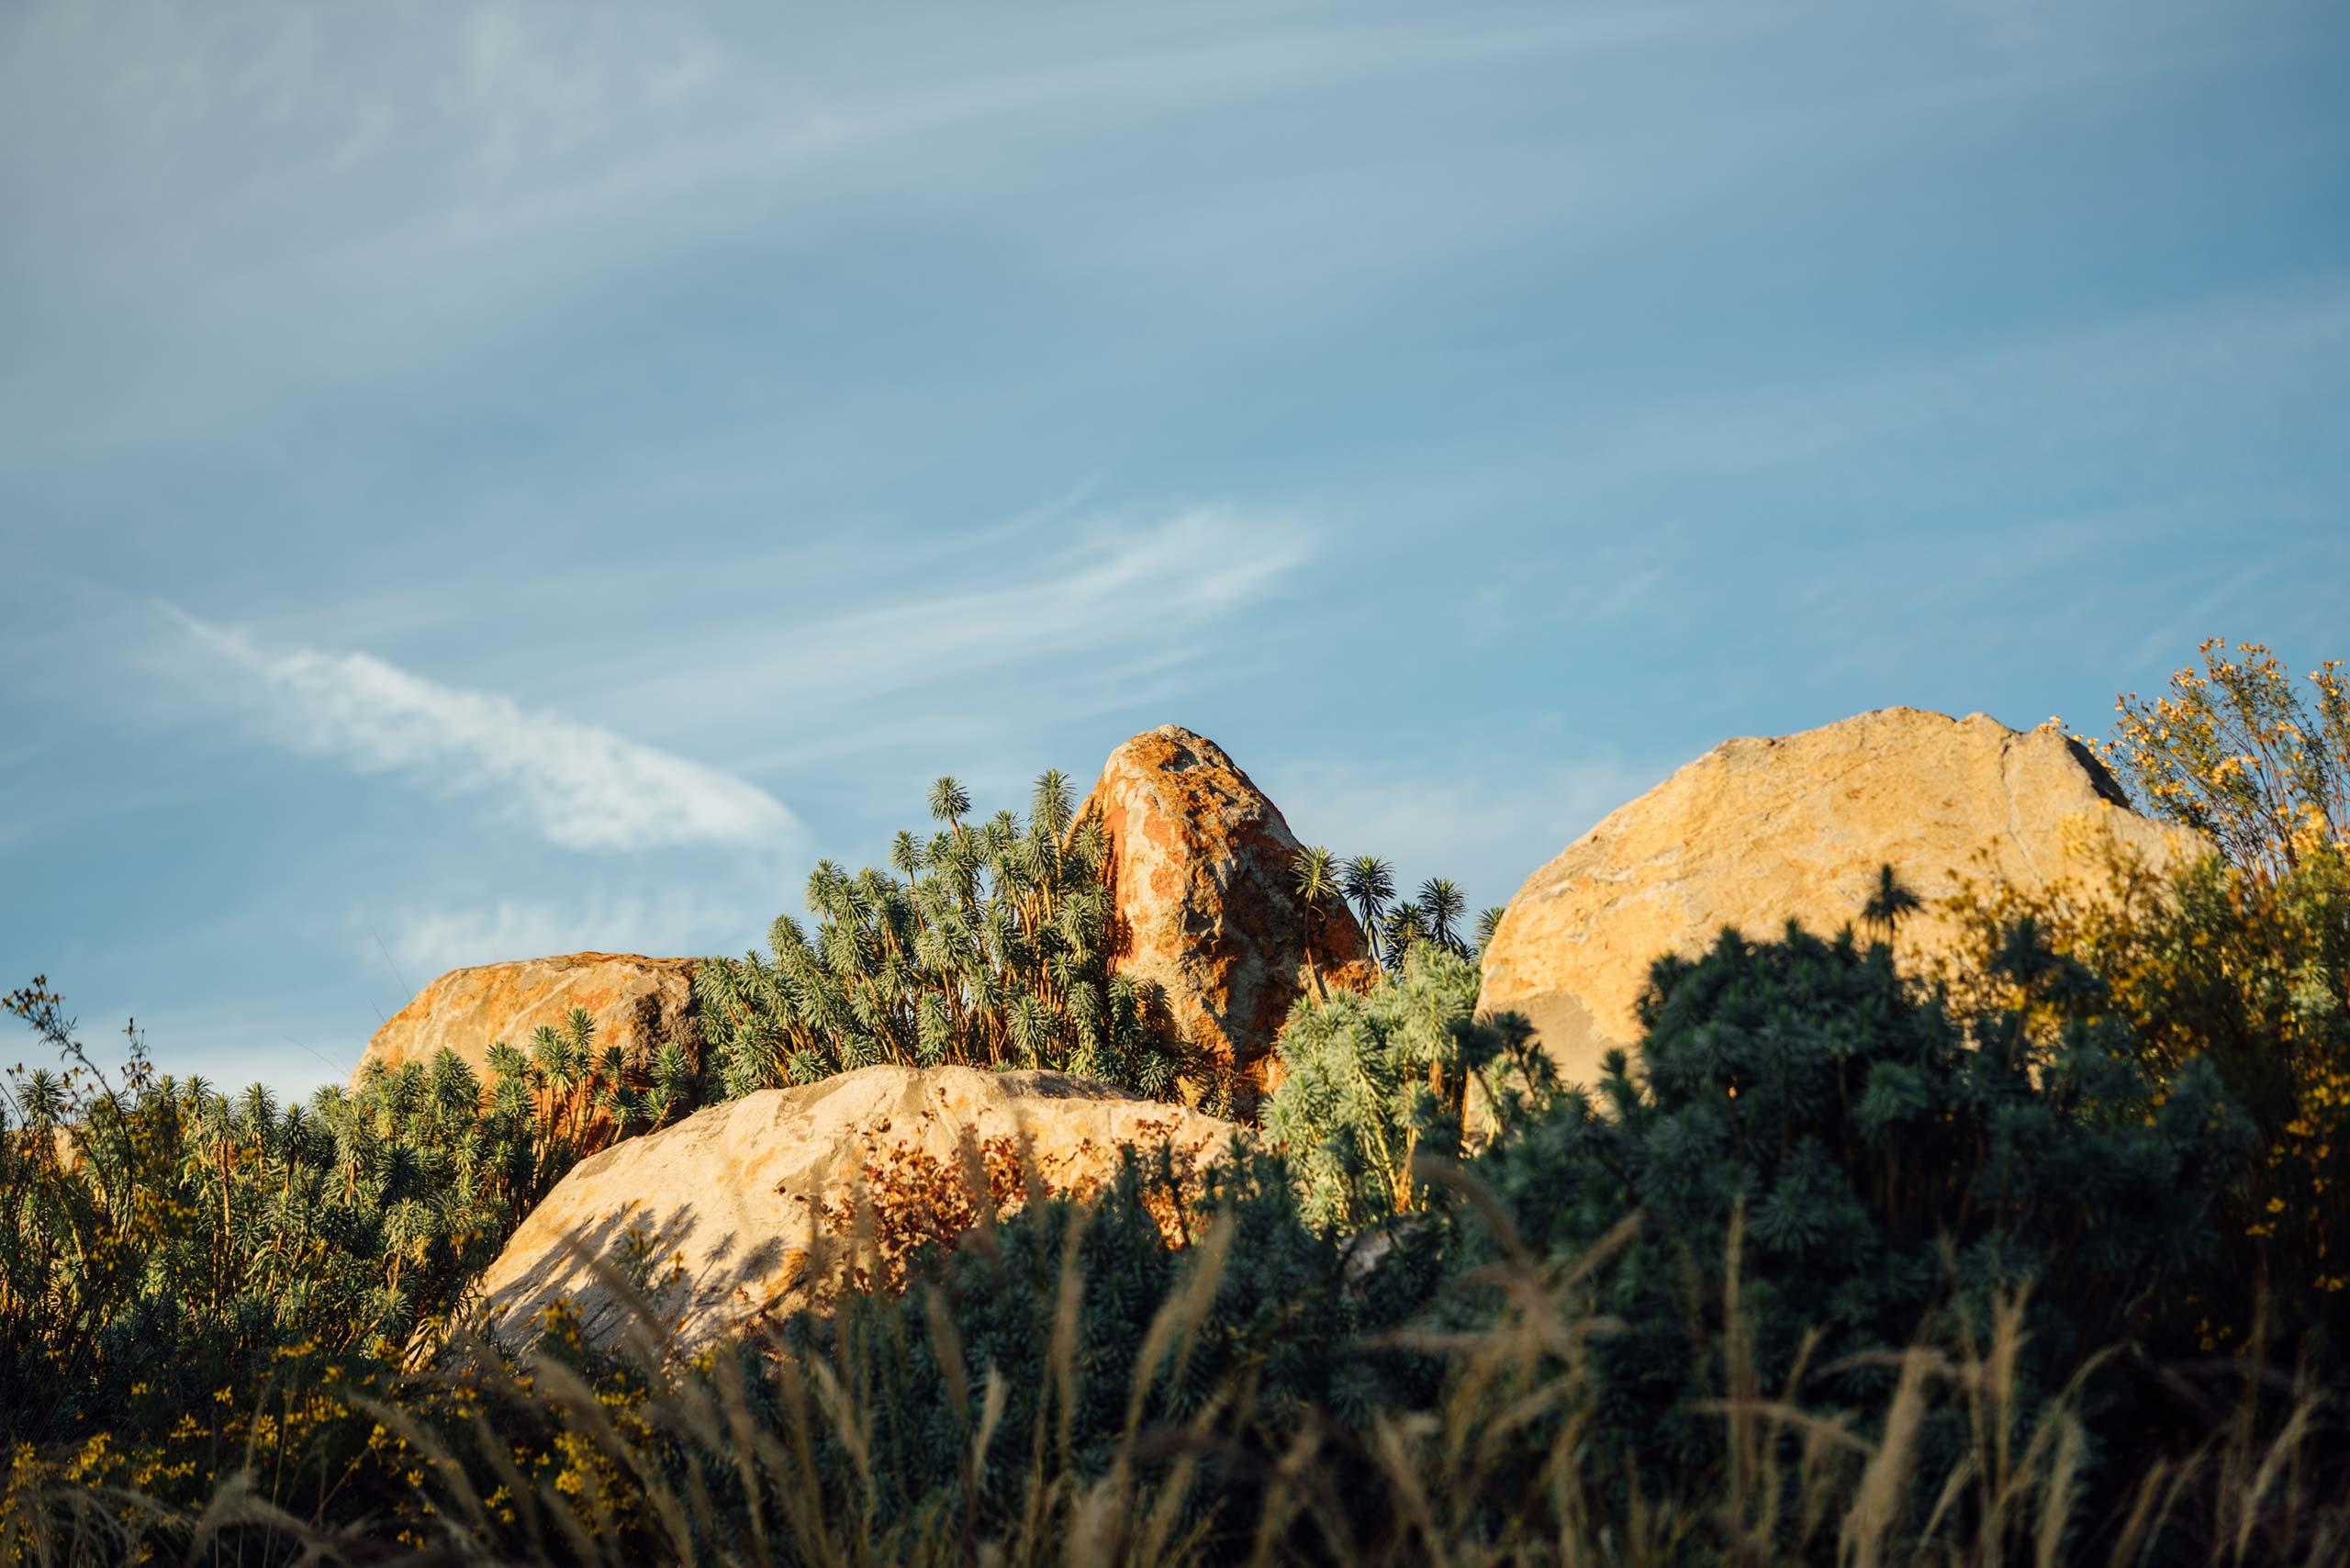 Rocky terrain at OVID